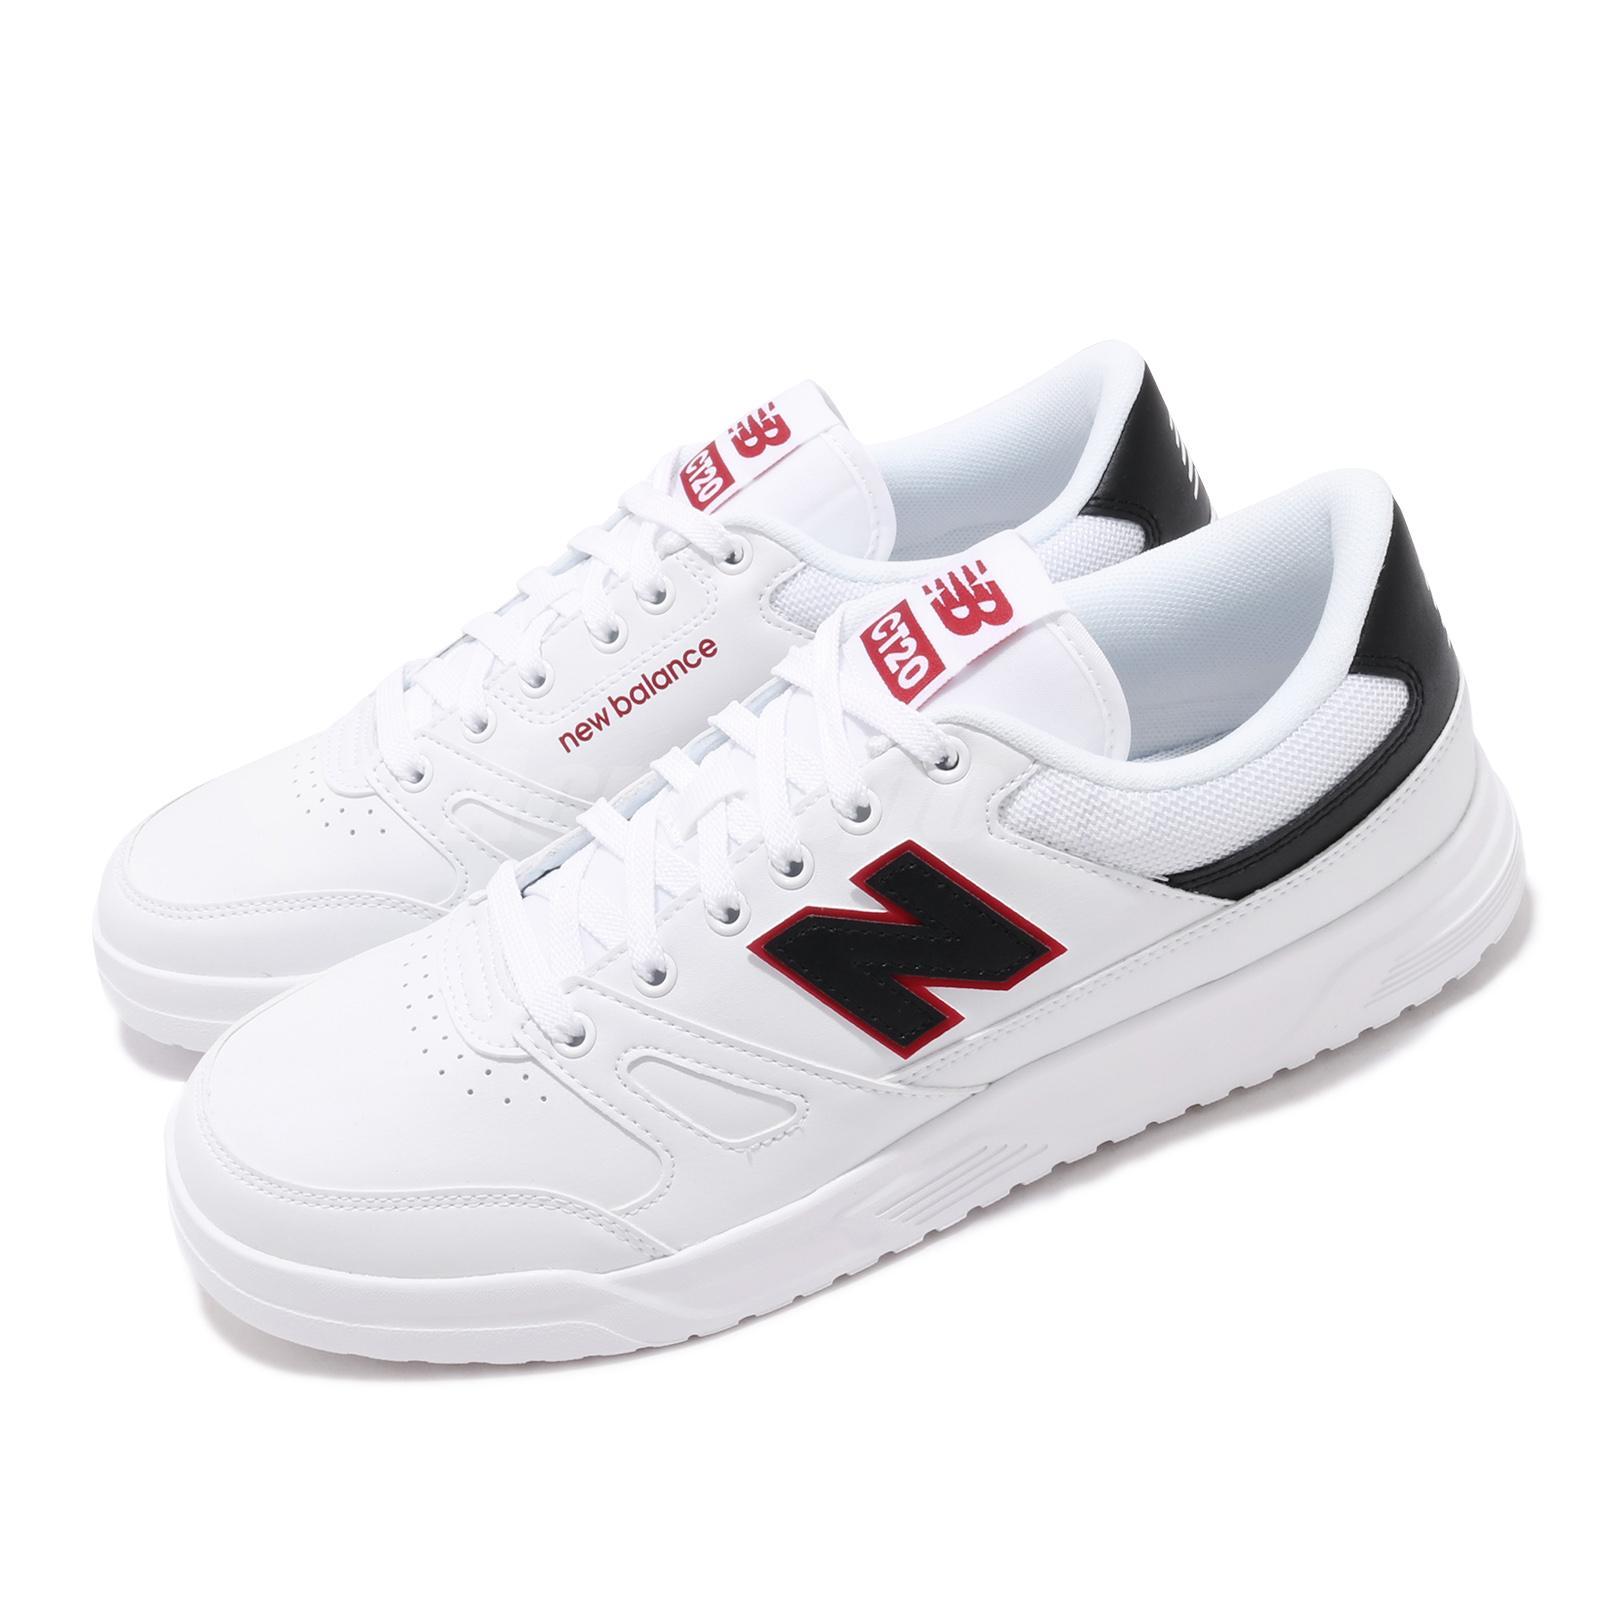 New Balance CT20 White Black Red Men